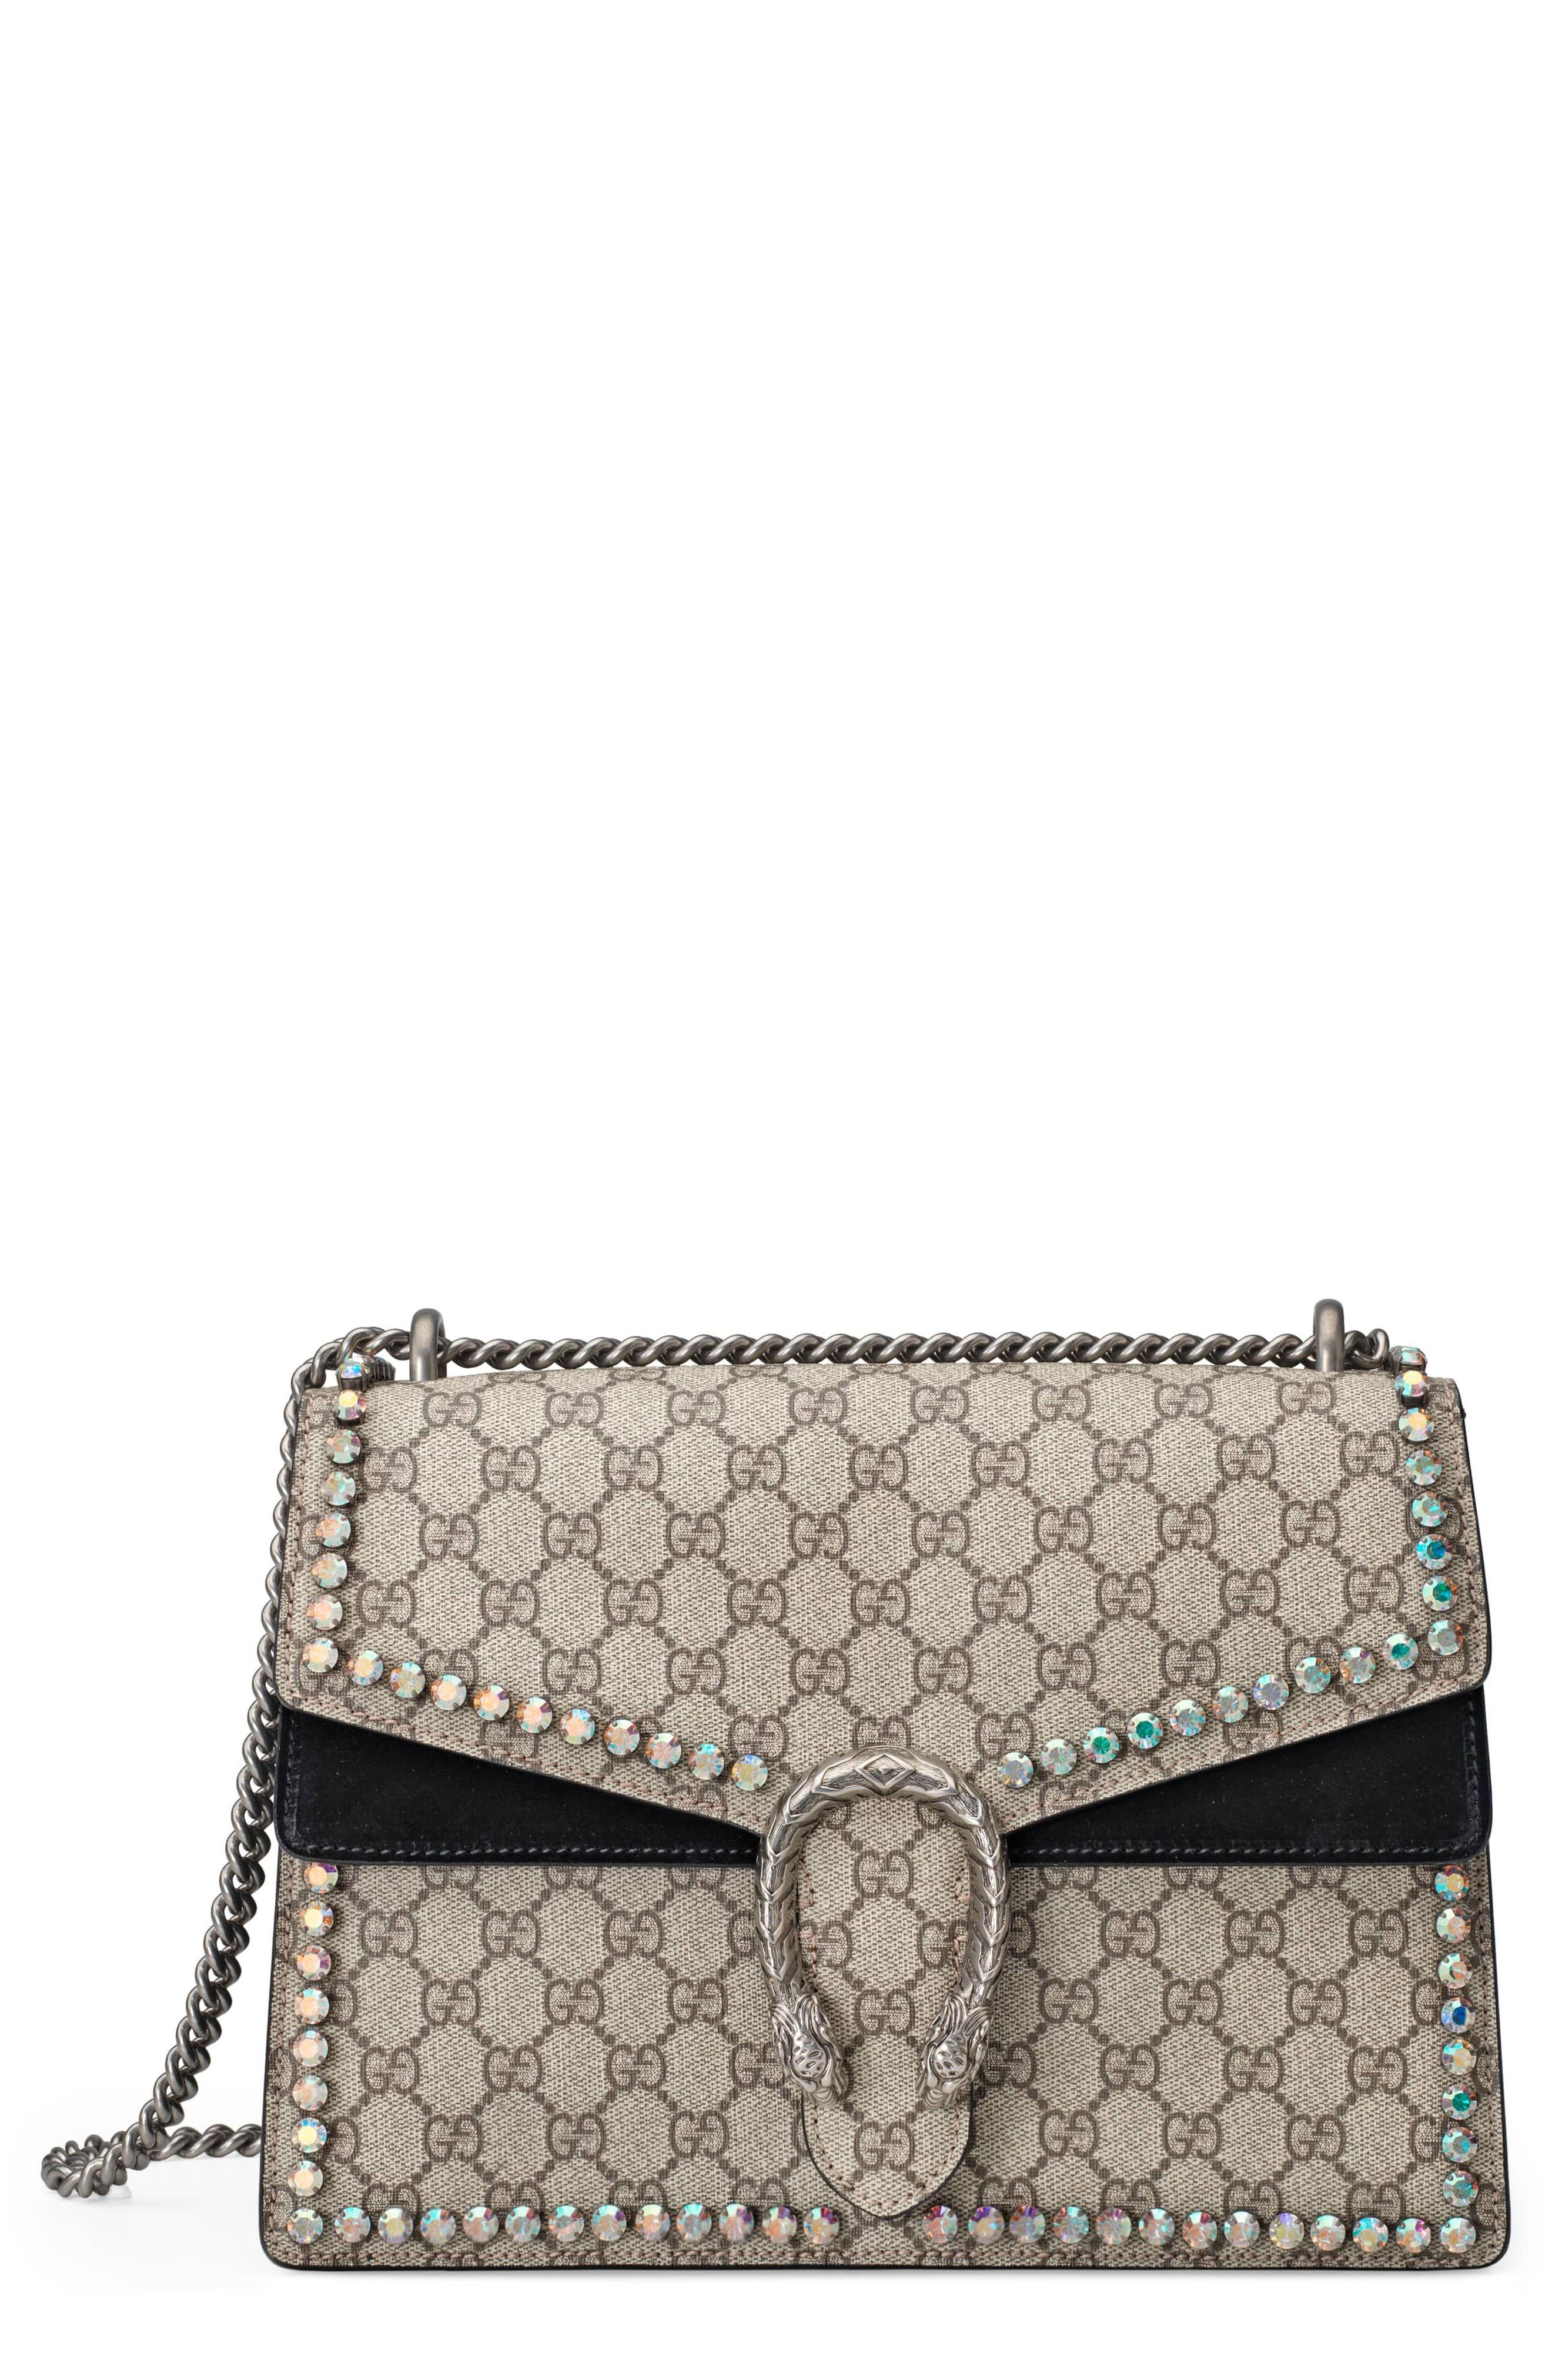 Gucci Medium Dionysus Crystal Embellished GG Supreme Canvas